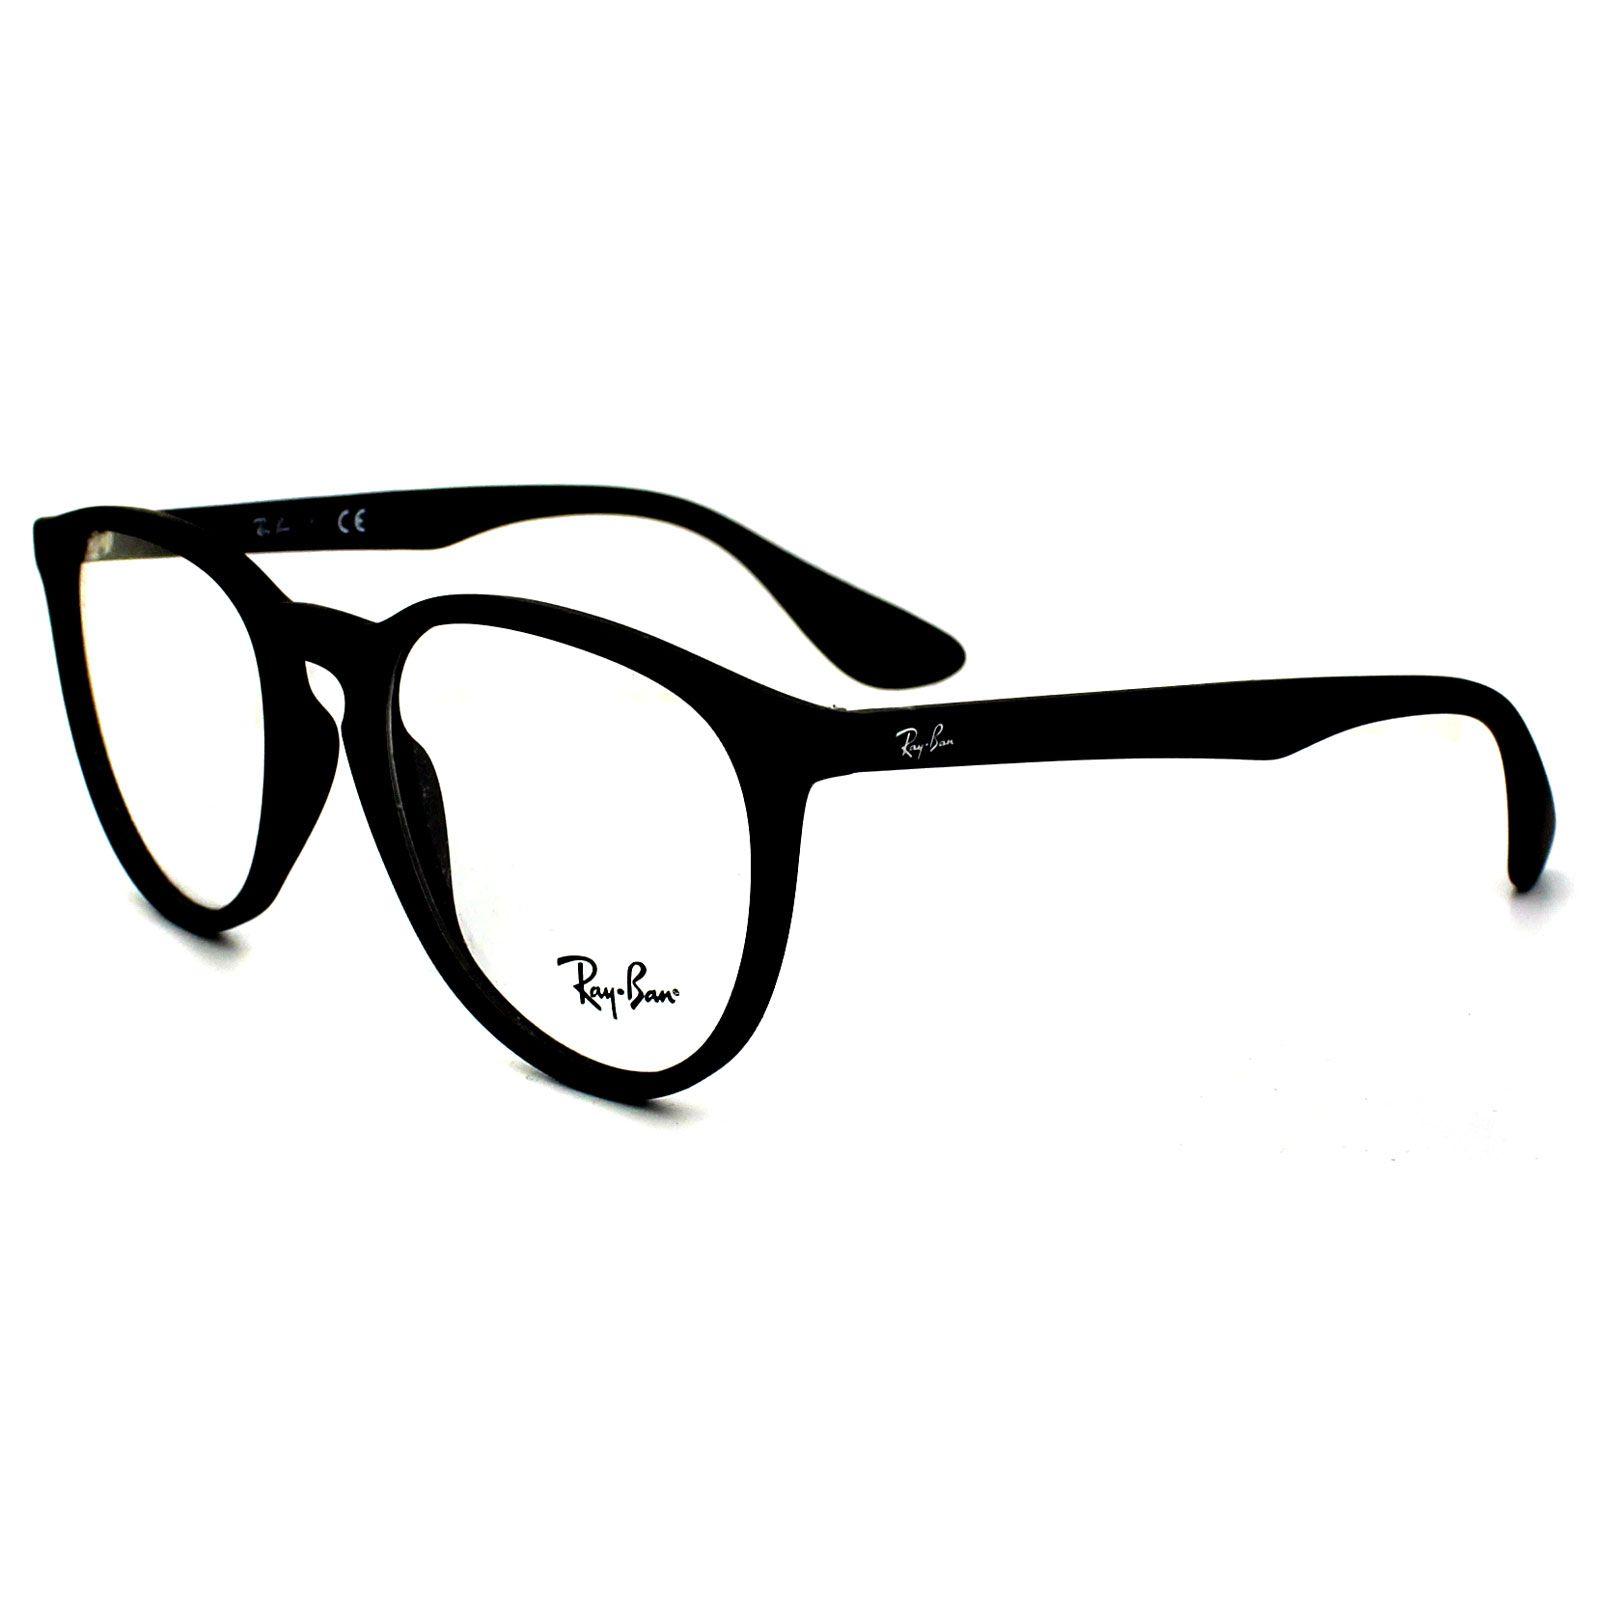 08fff4912f Género: Hombre Material: Pasta Color: Negro | Sunglasses | Lentes ...